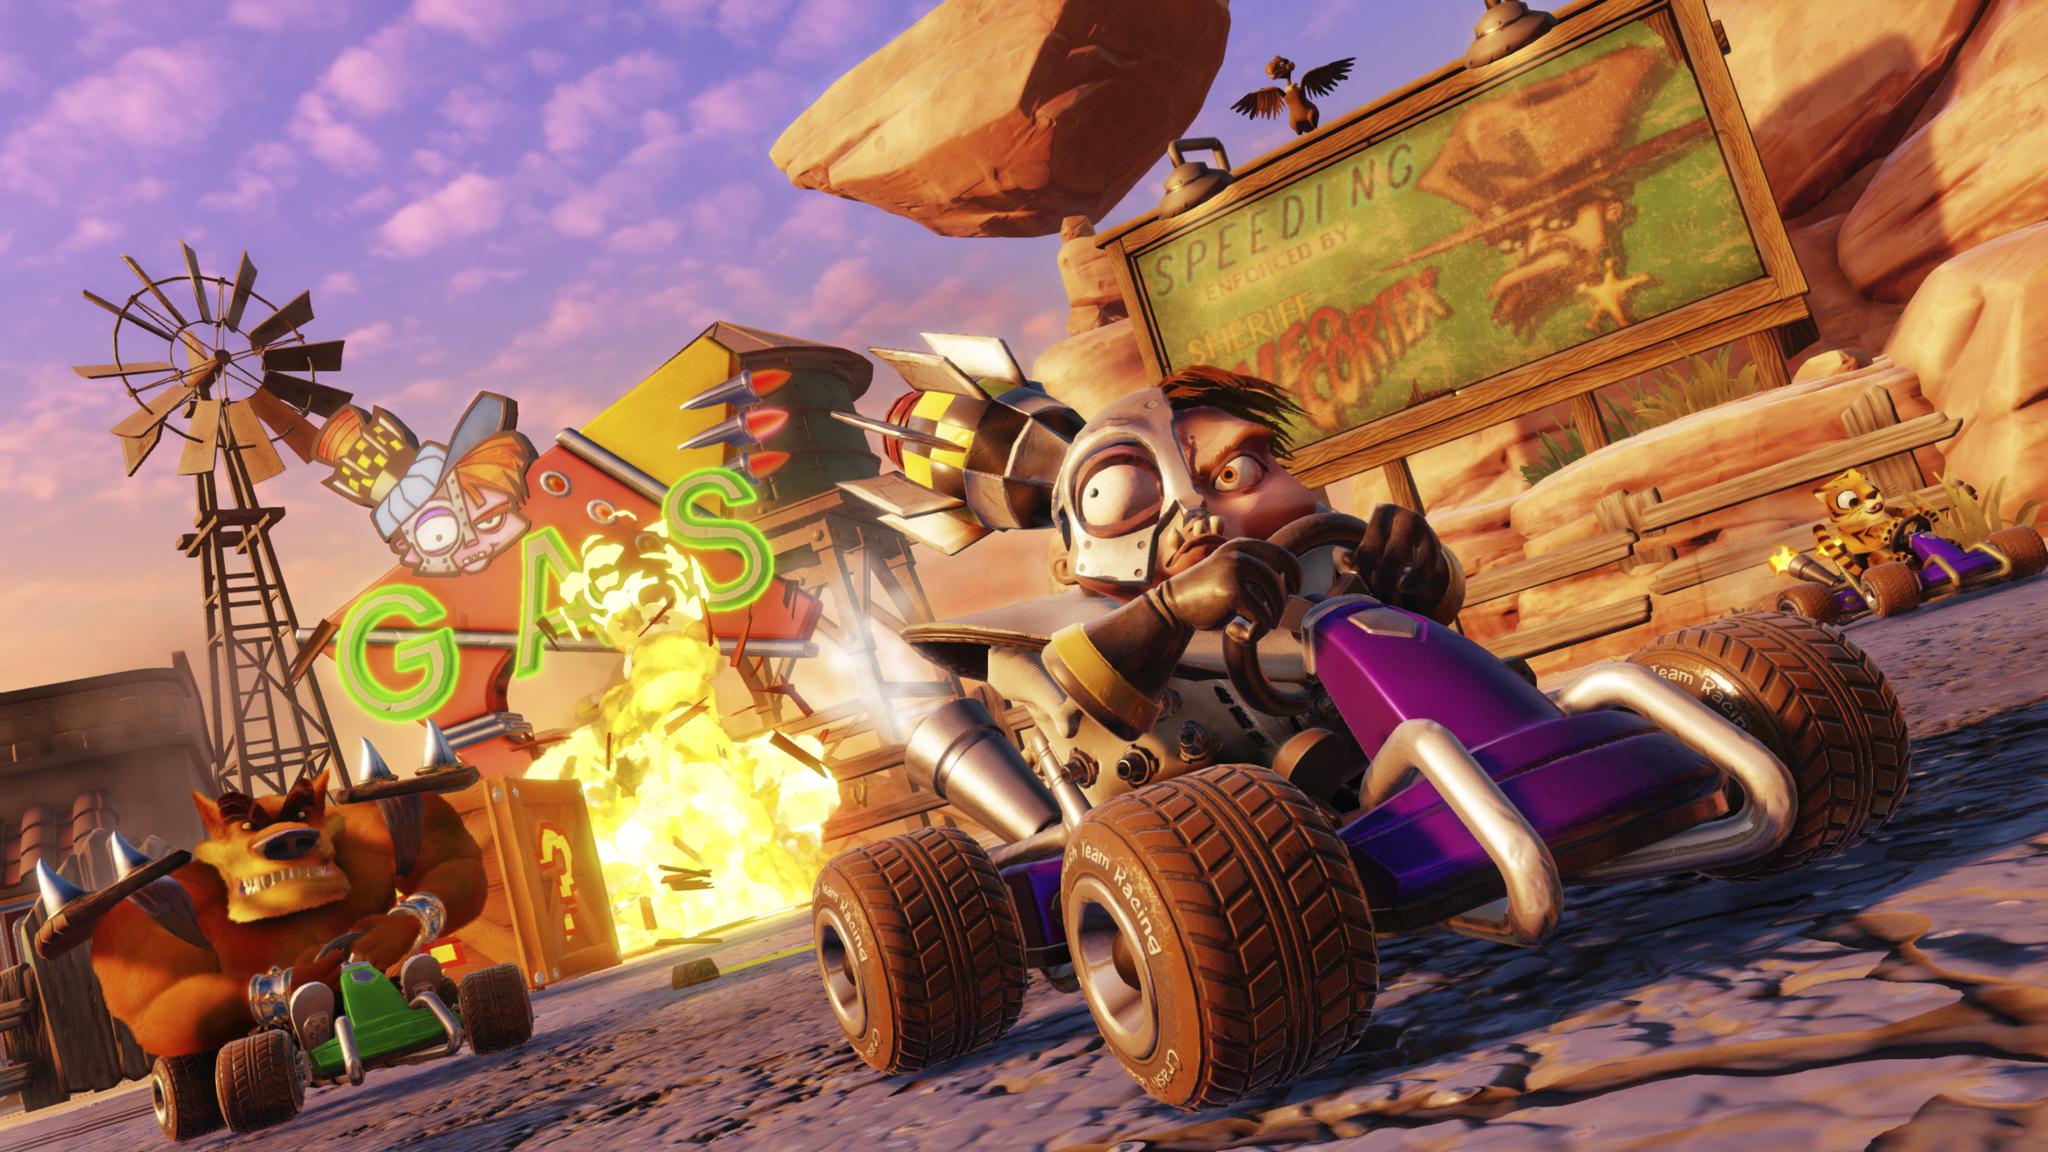 Crash Team Racing Nitro Fueled Delivers 4K Fun Watch Variety 2048x1152